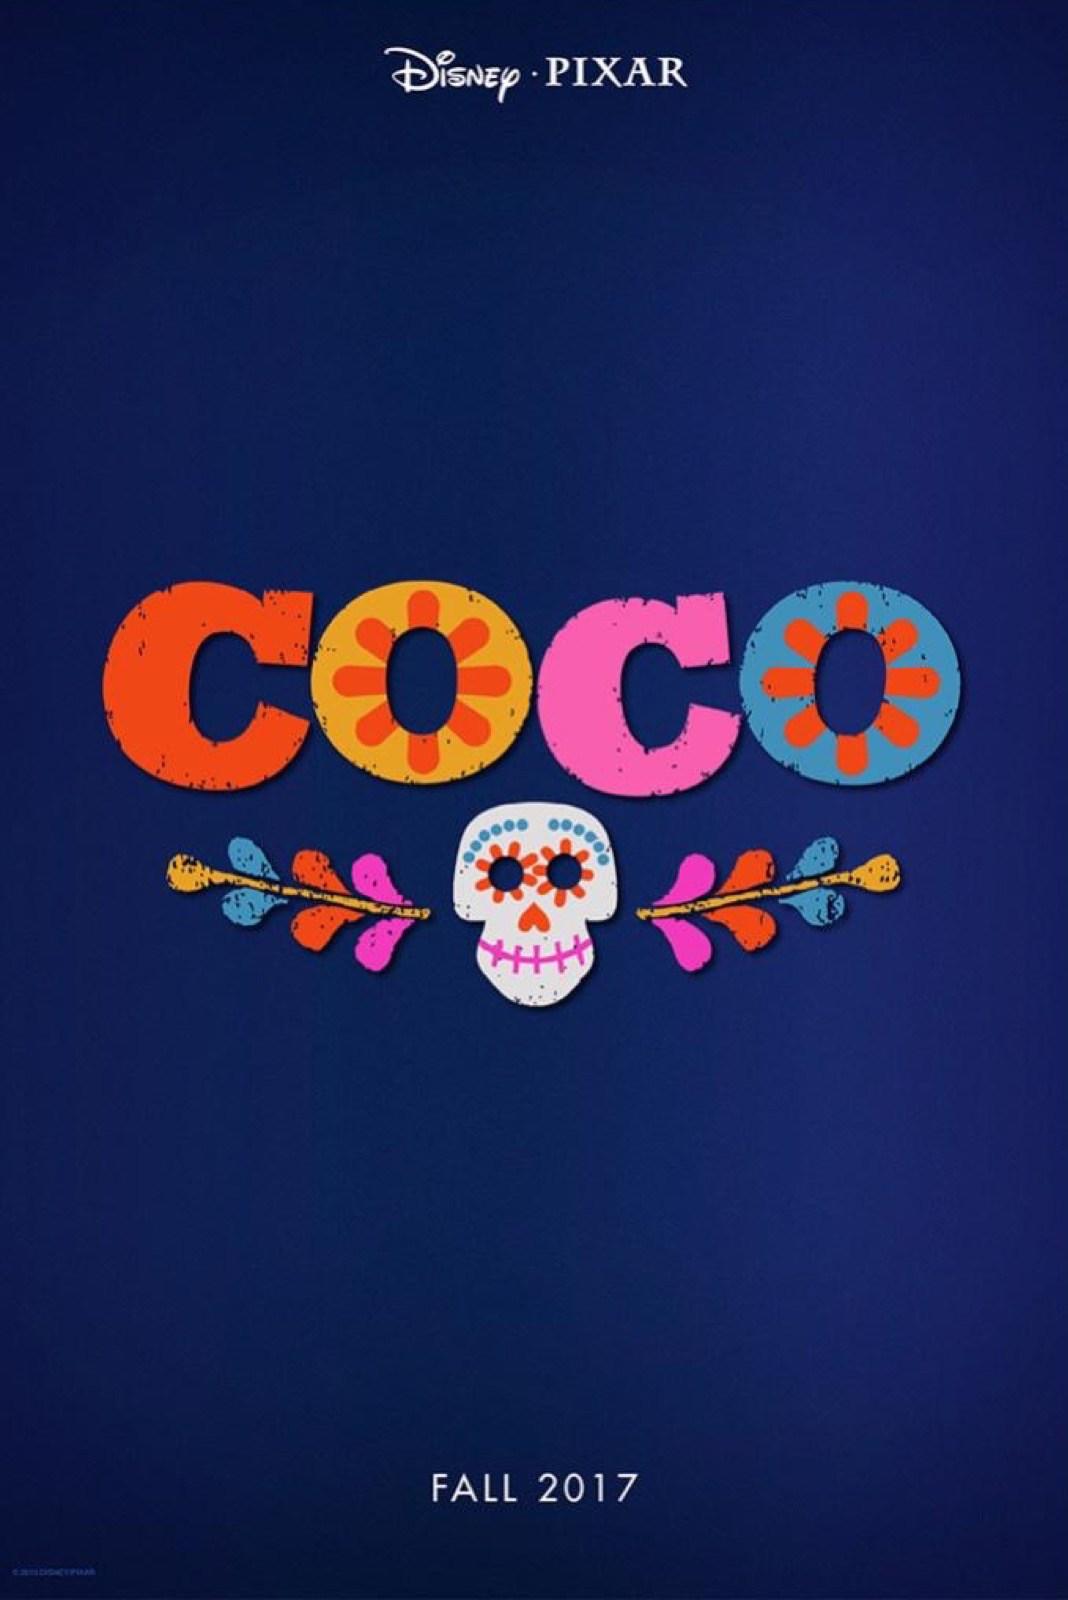 2017 Coco.jpg